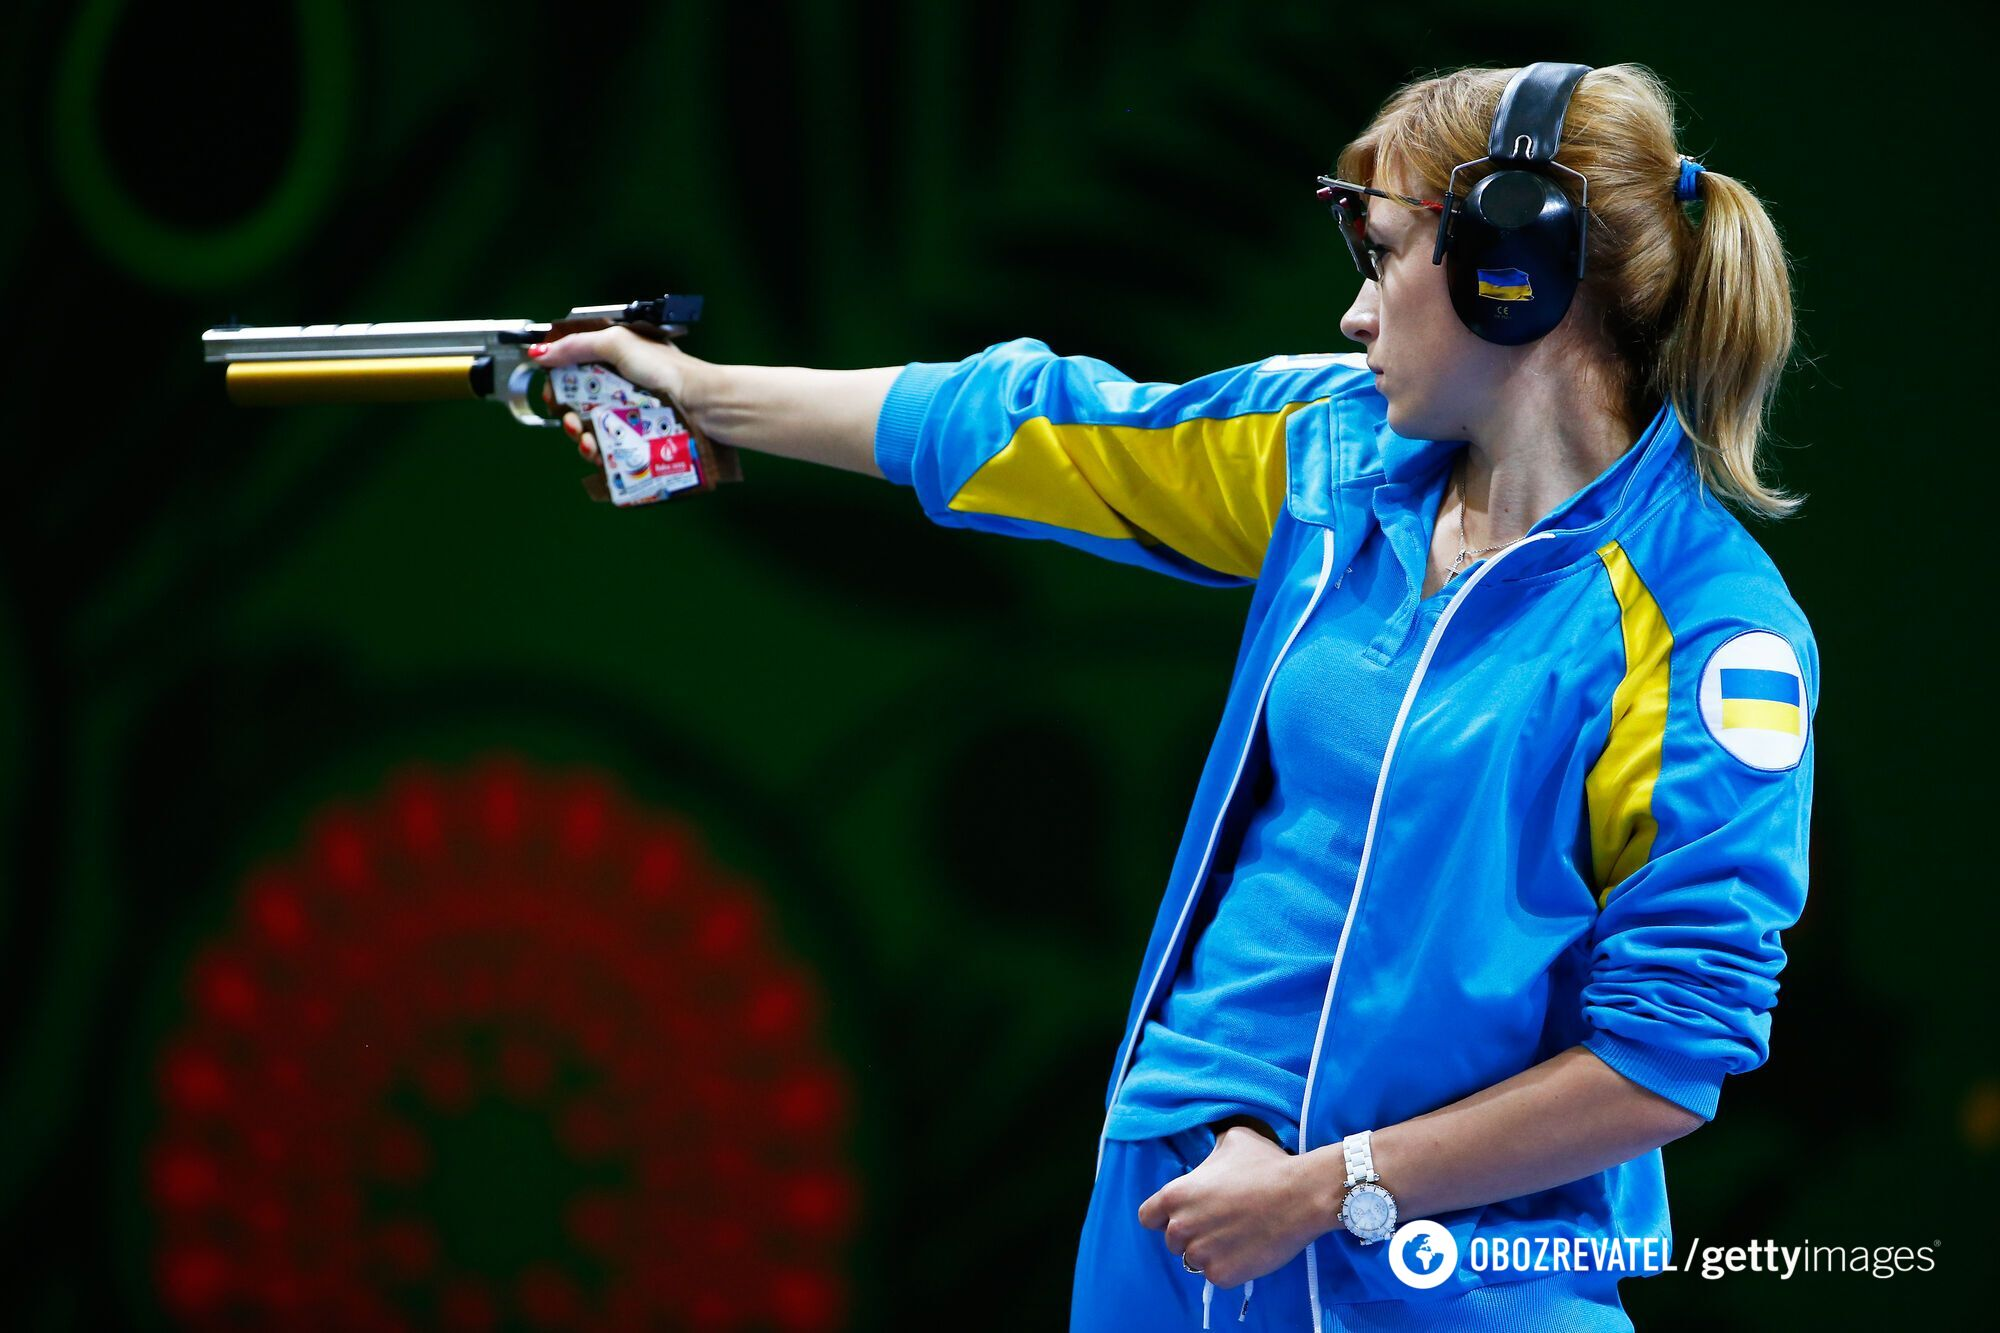 Елена Костевич на соревнованиях